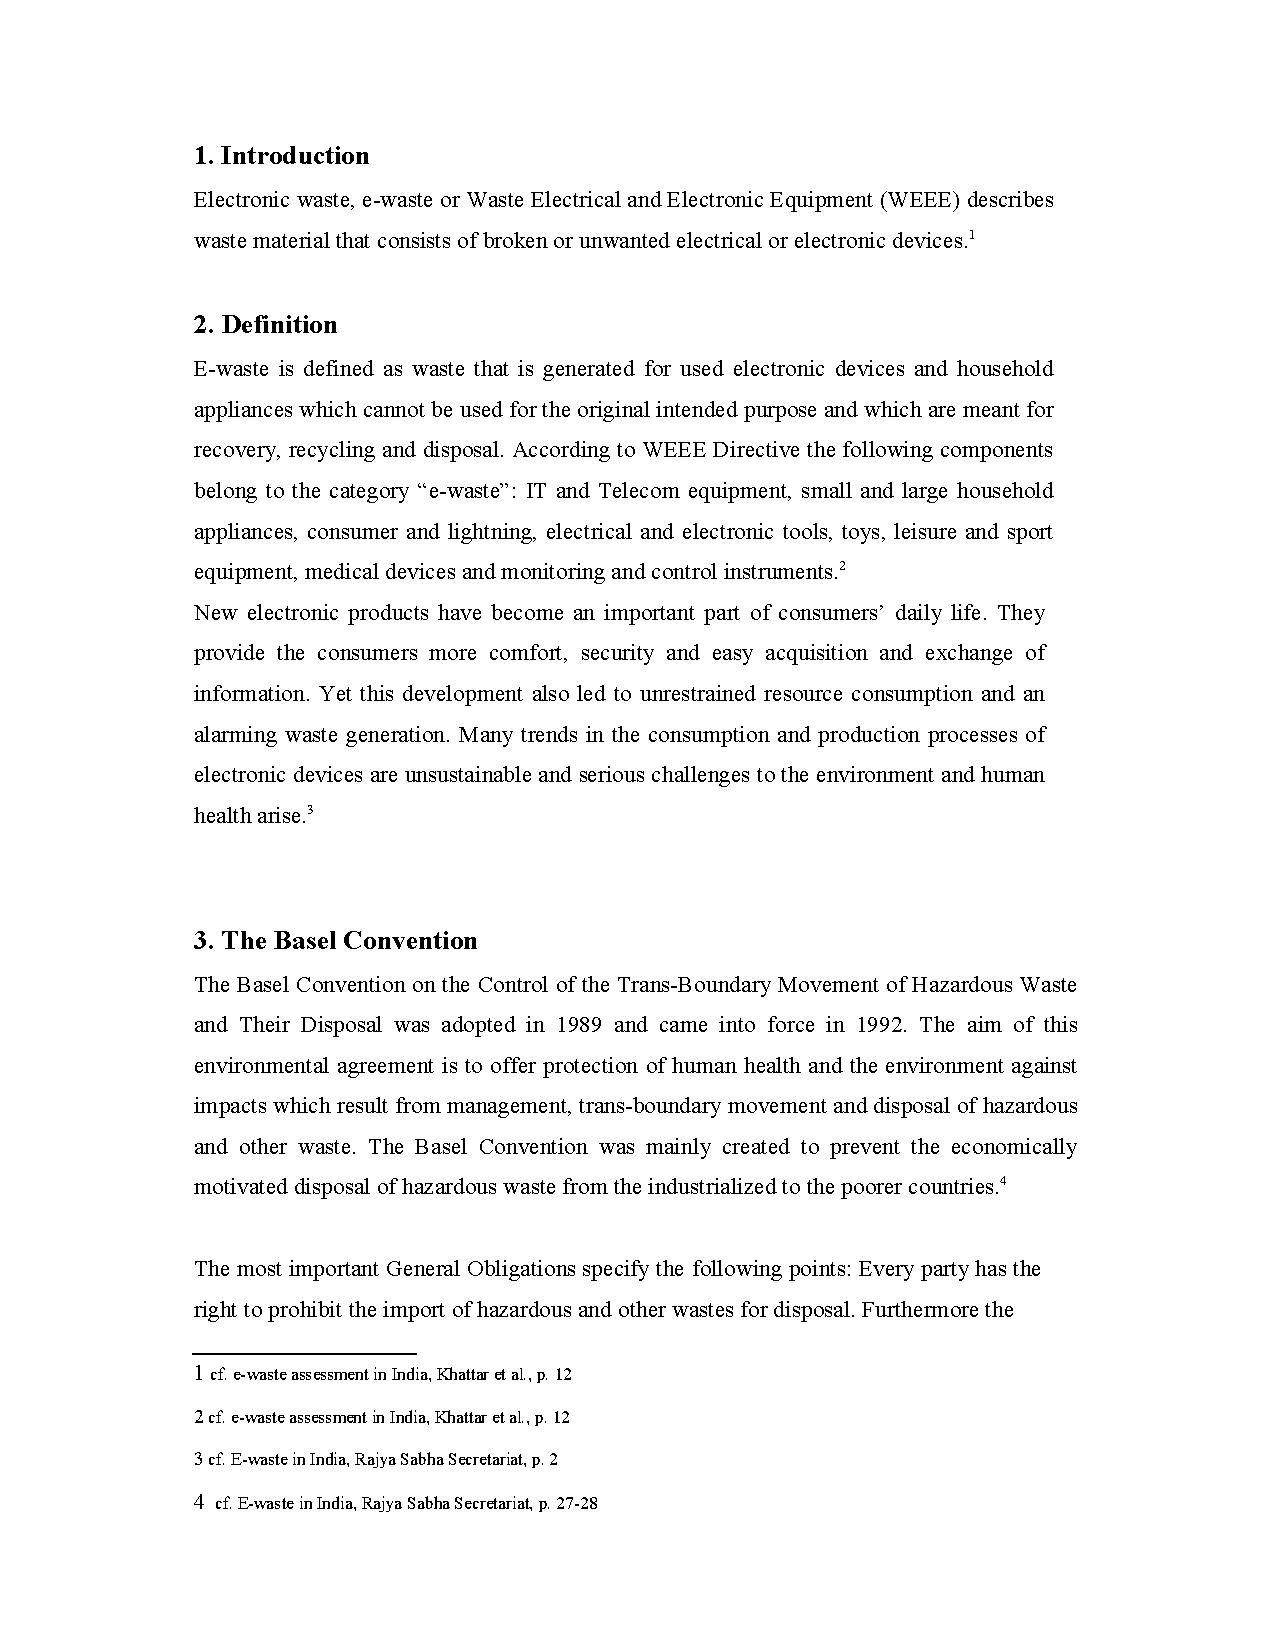 file:e-waste in india.pdf - wikimedia commons